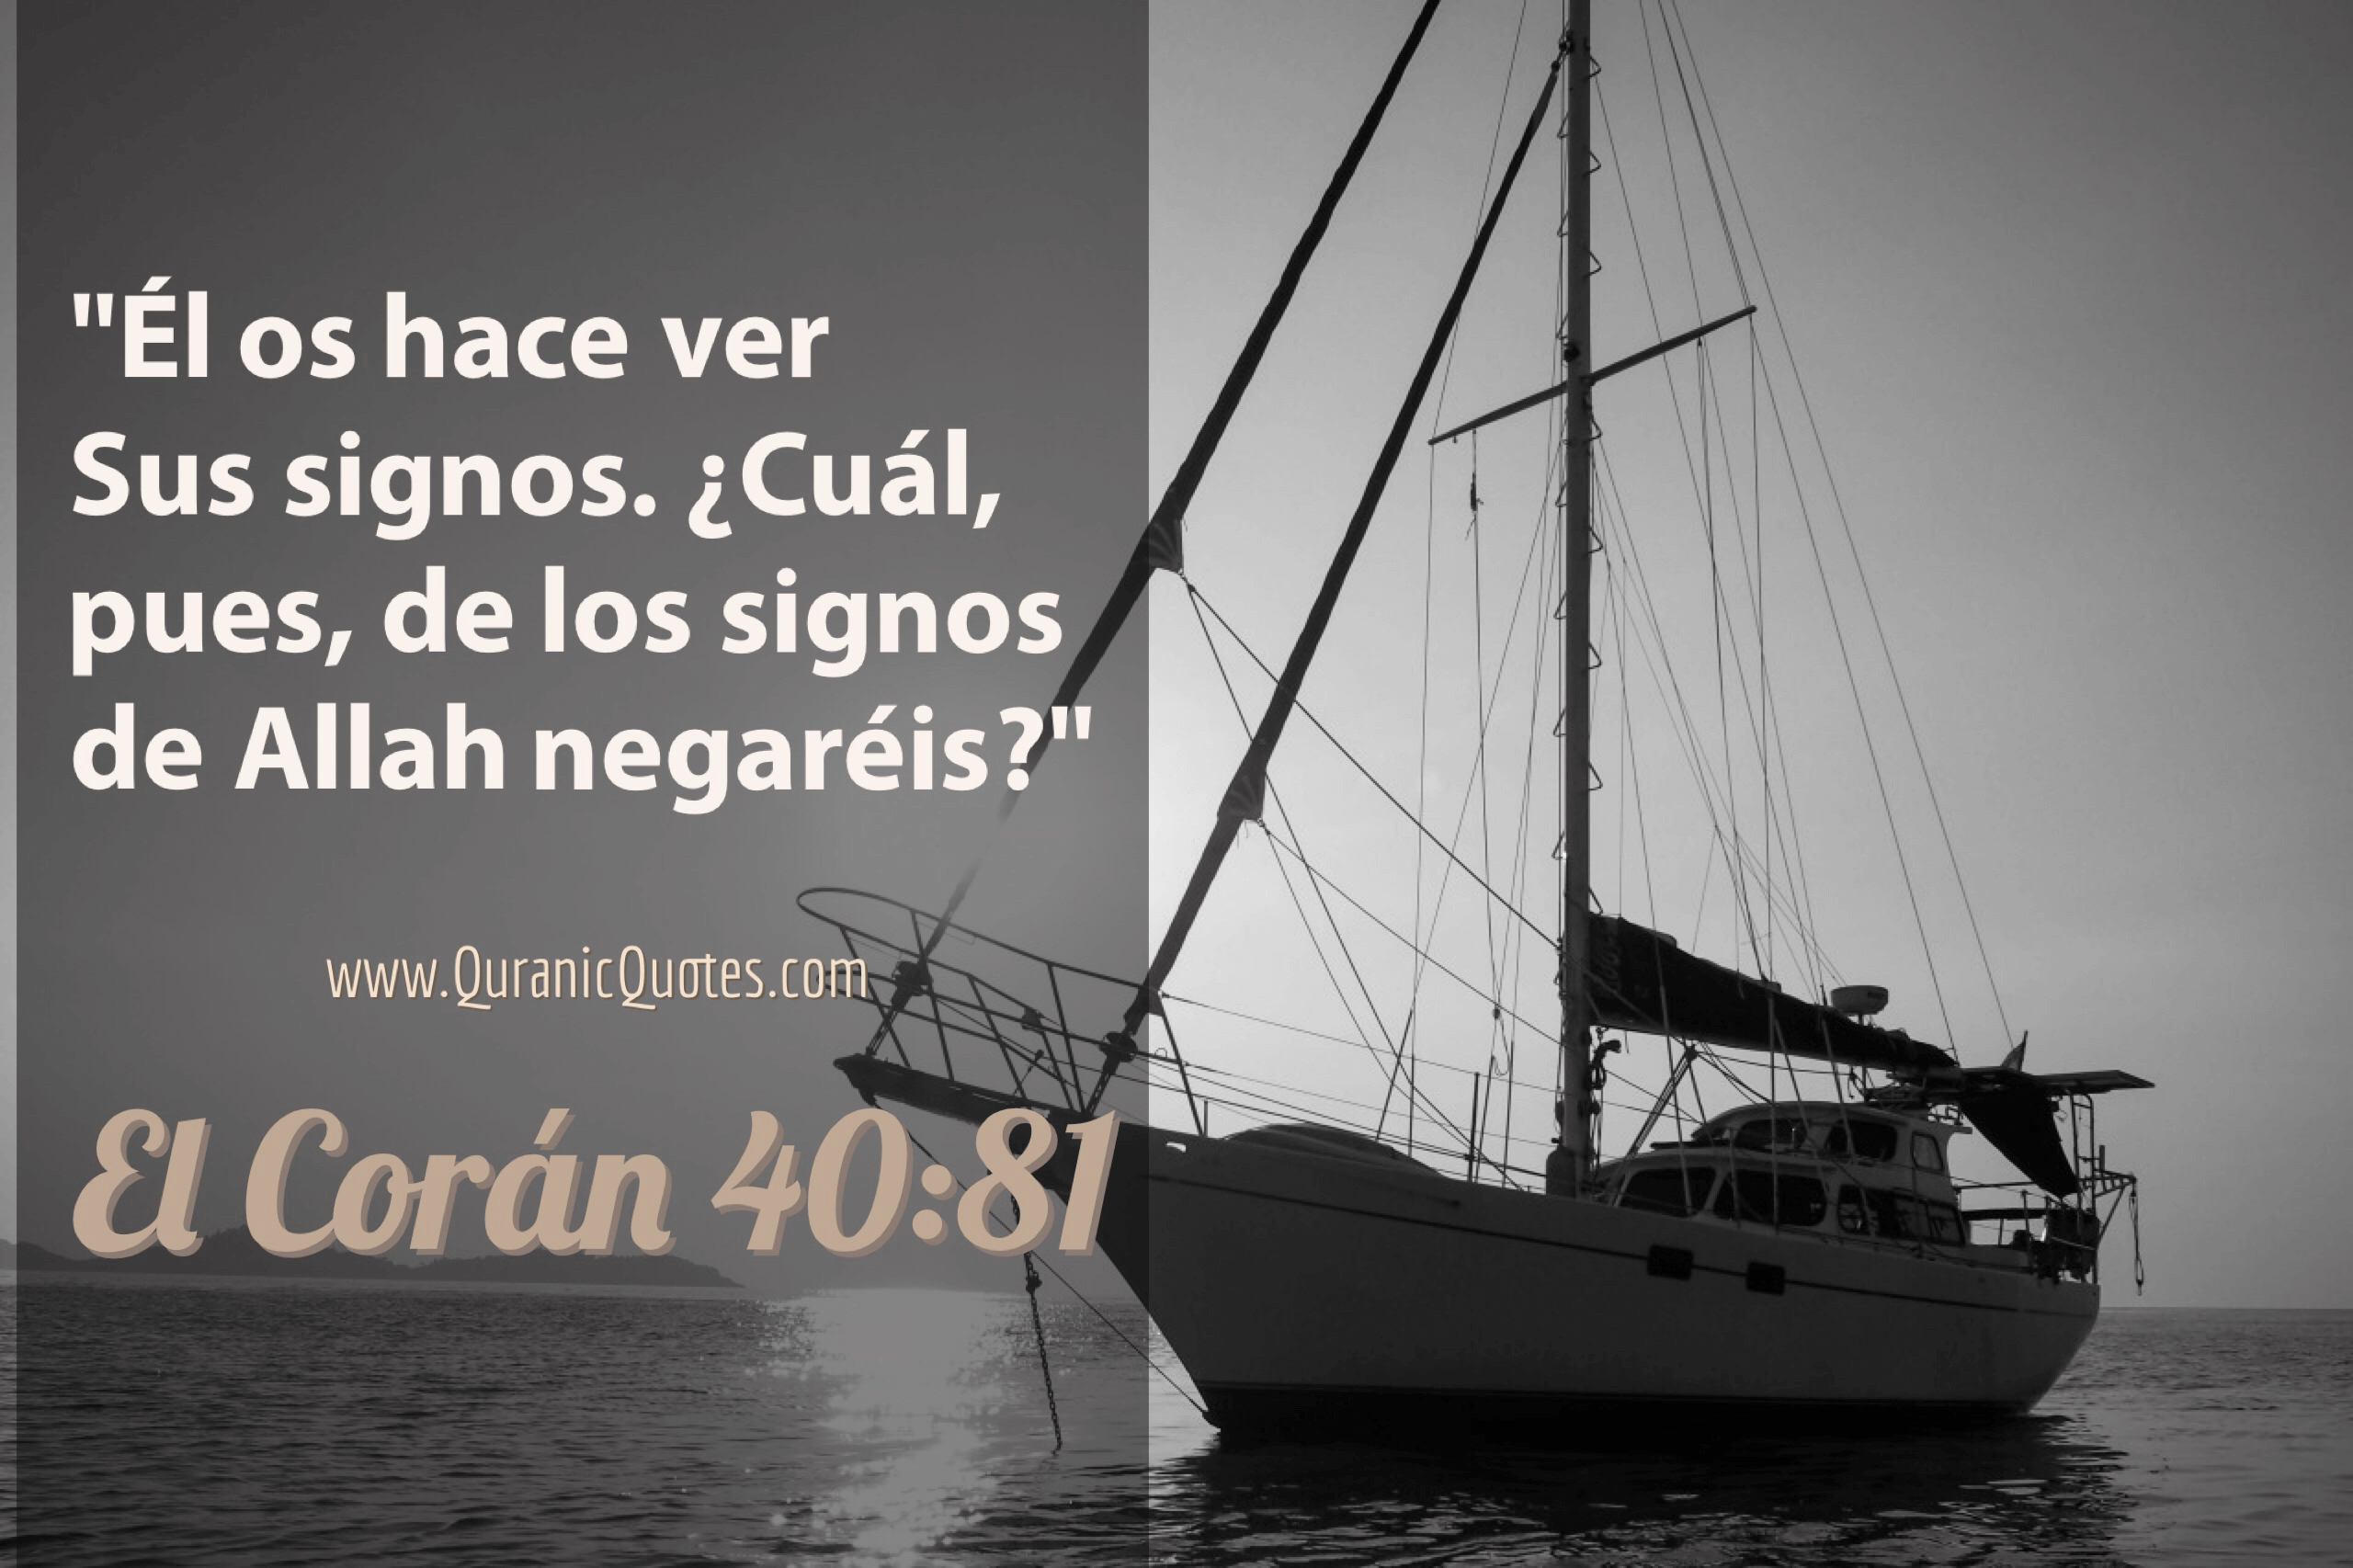 44 El Corán 40:81 (Surah Ghafir) And He shows you His Signs